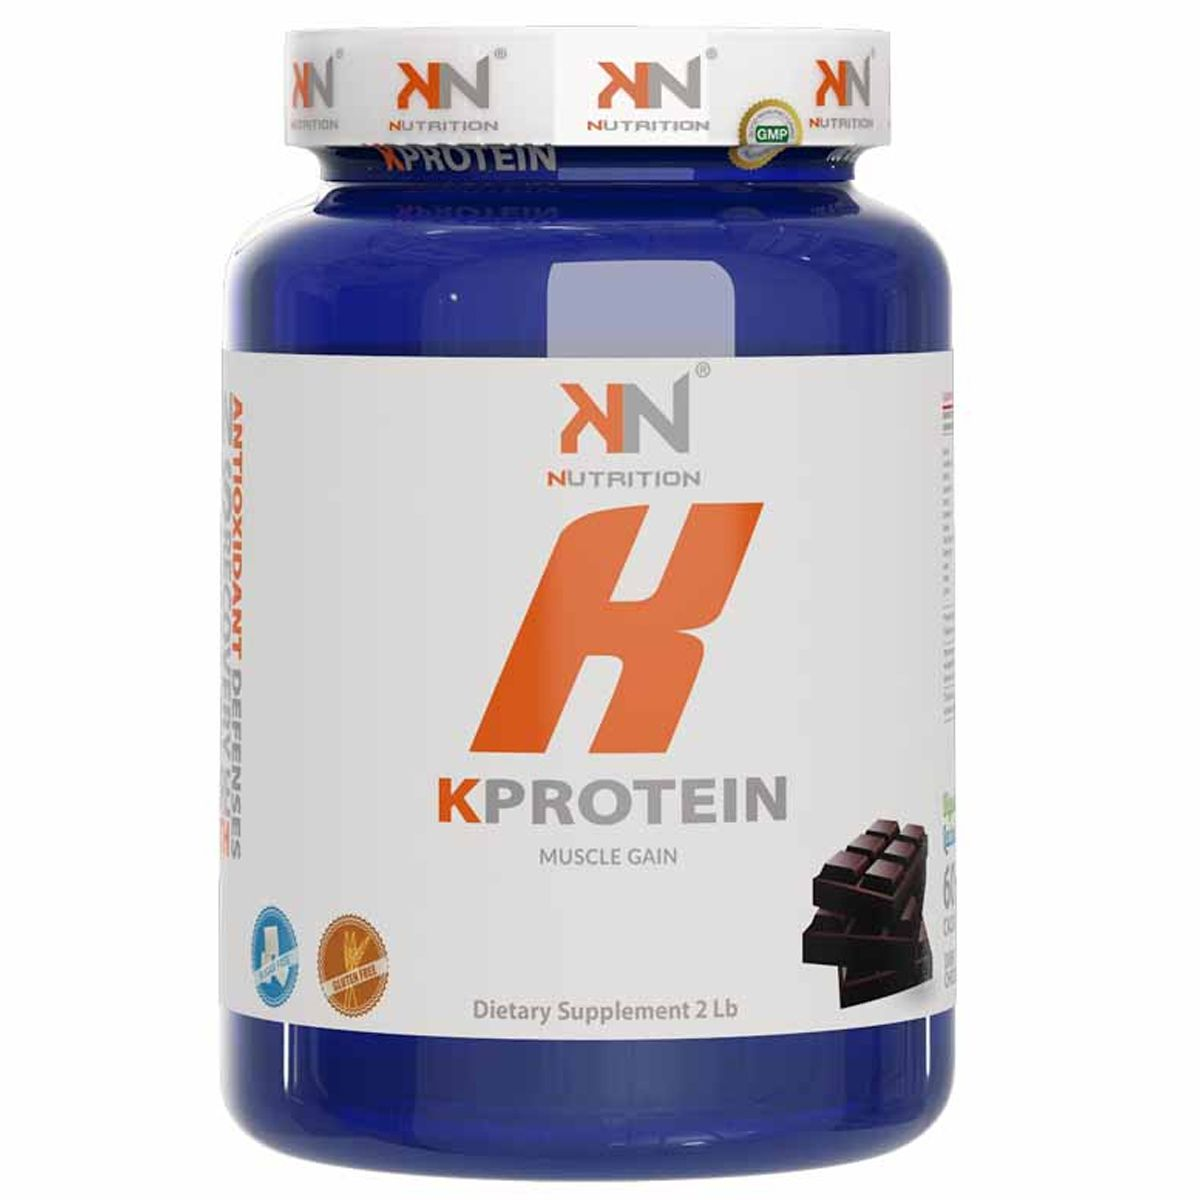 K-Protein - 900g - KN Nutrition